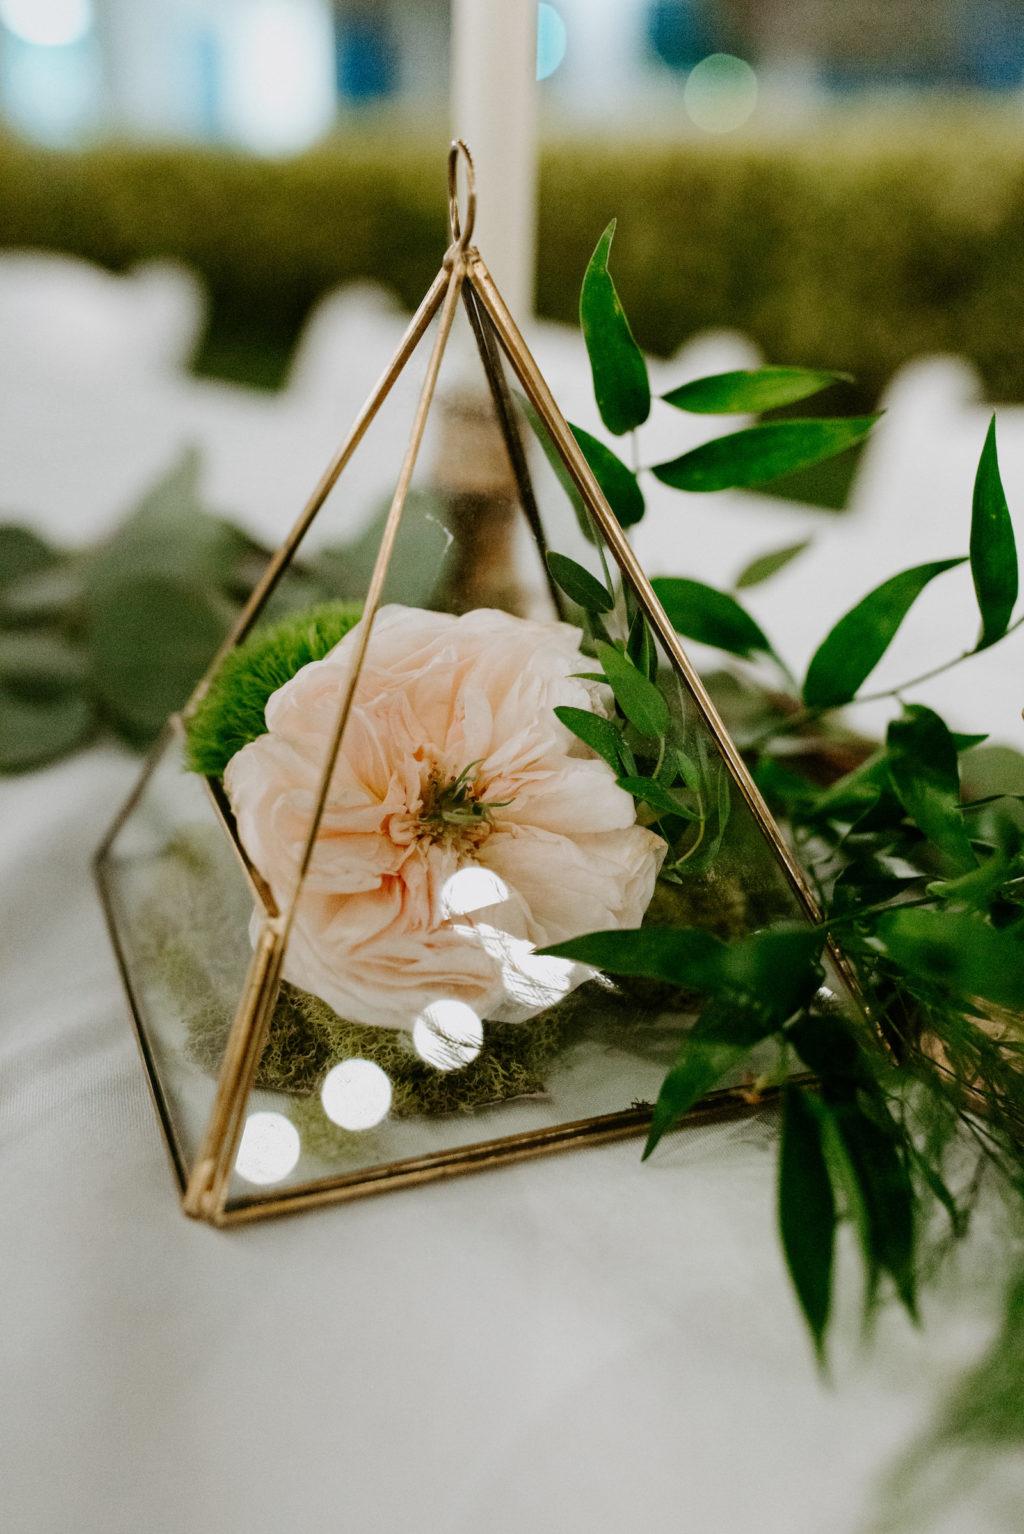 Garden Wedding Reception Decor, Geometric Gold Pyrimid with Single Blush Pink Rose